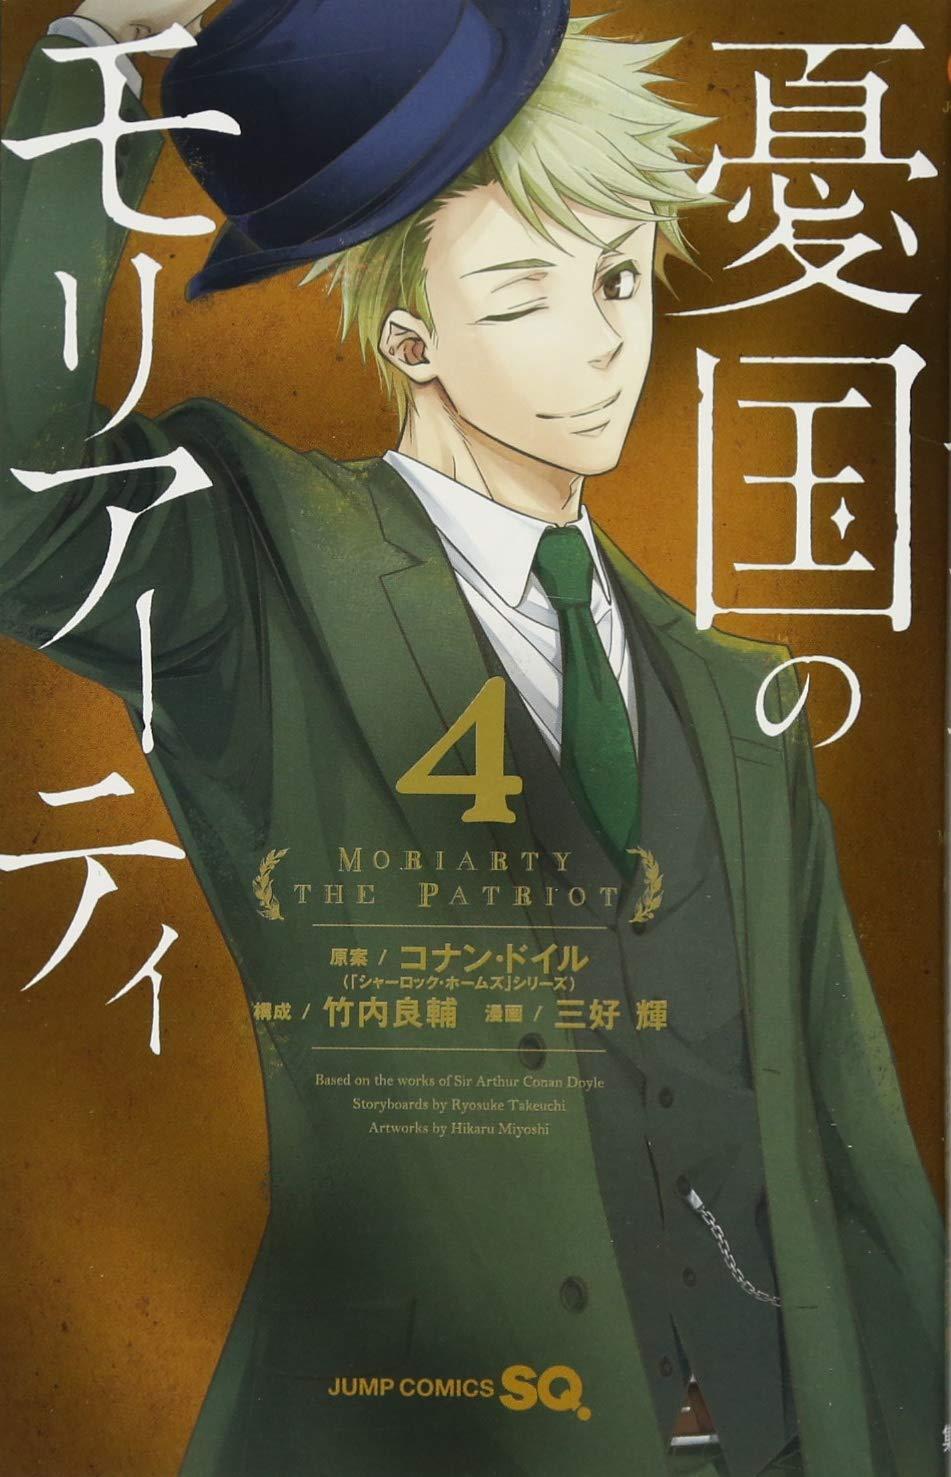 Moriarty the Patriote volume 4 cover